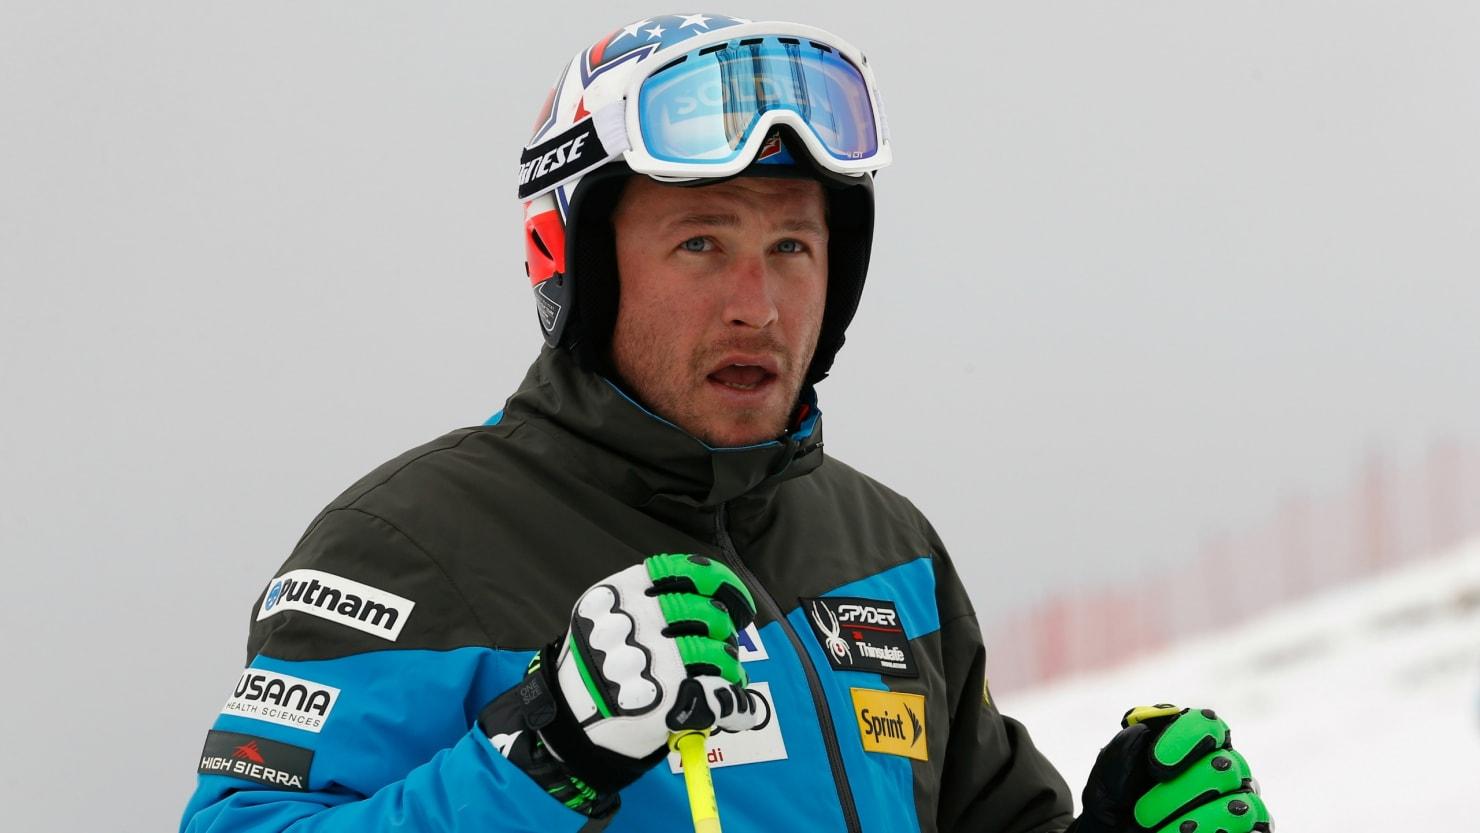 Olympic Skier Bode Miller S Toddler Daughter Drowns In Pool